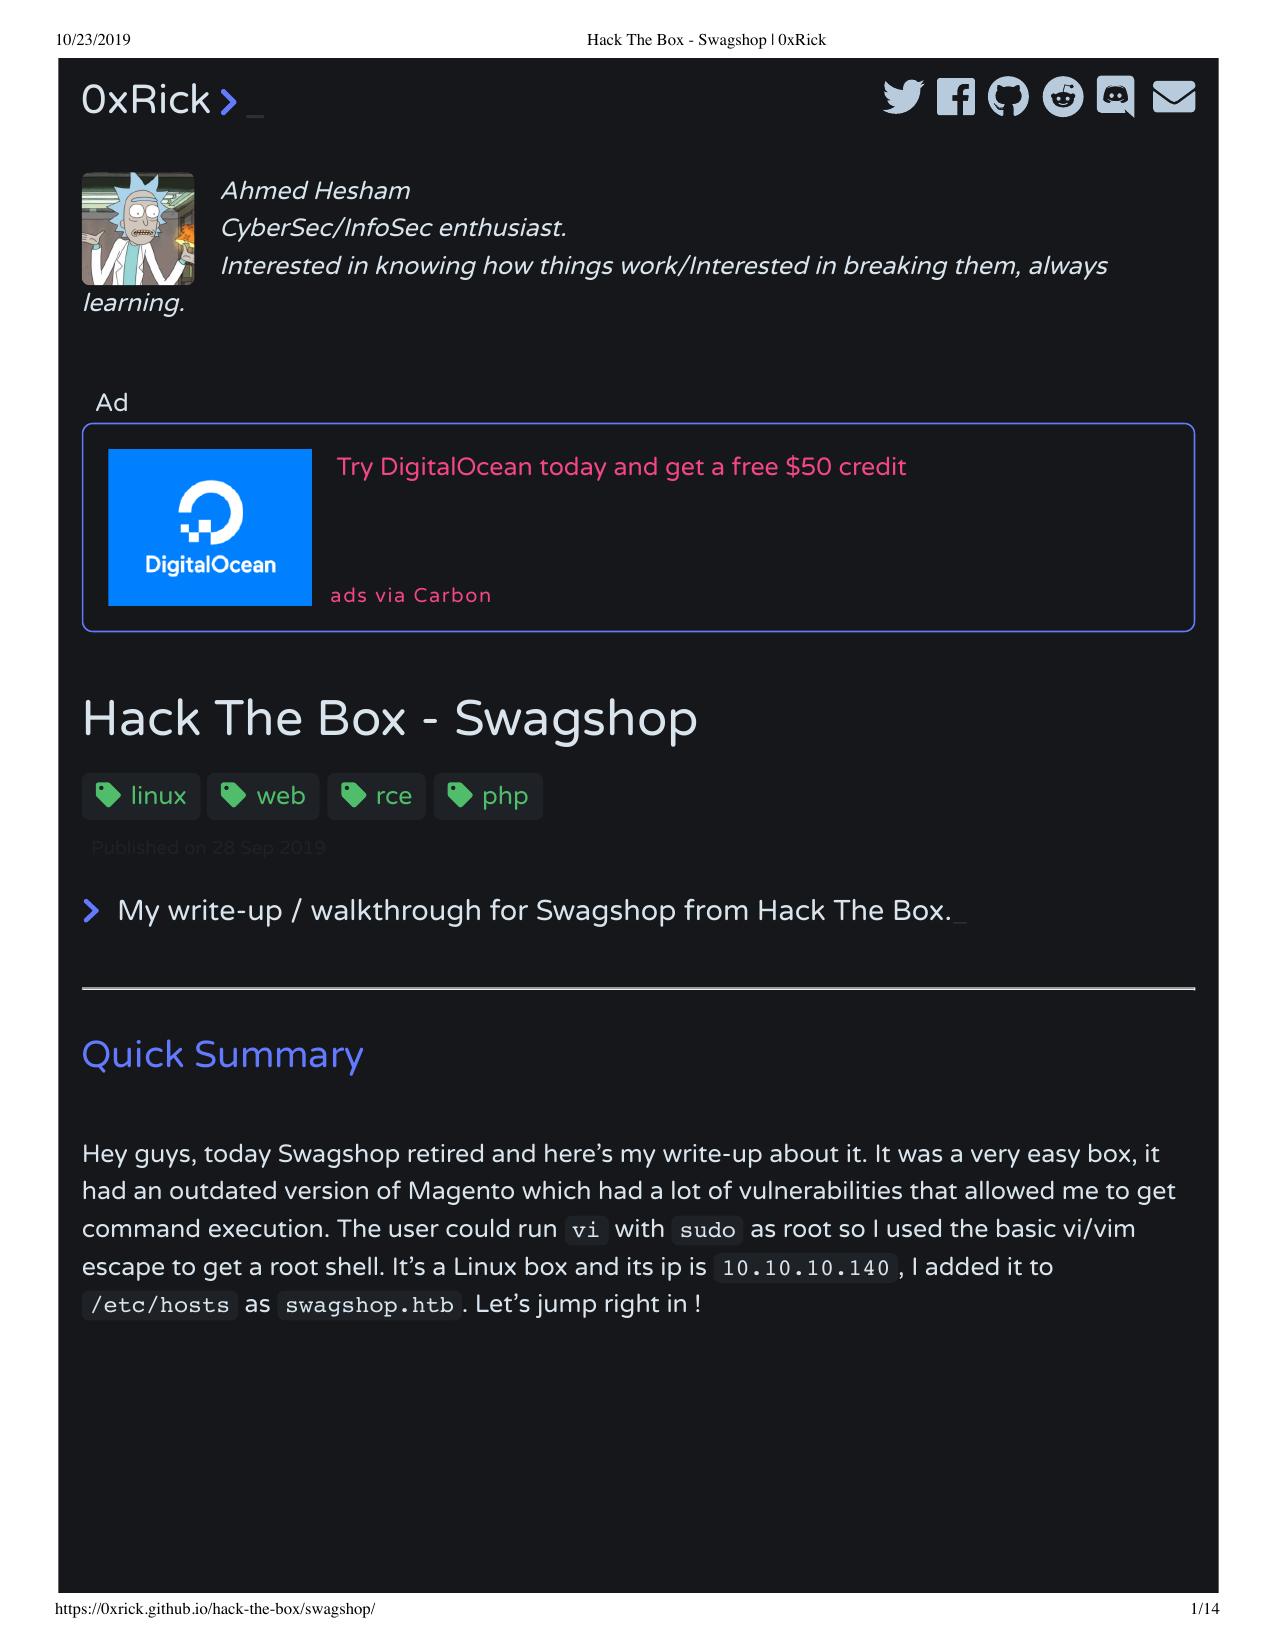 Hack The Box Swagshop 0xrick Writeup